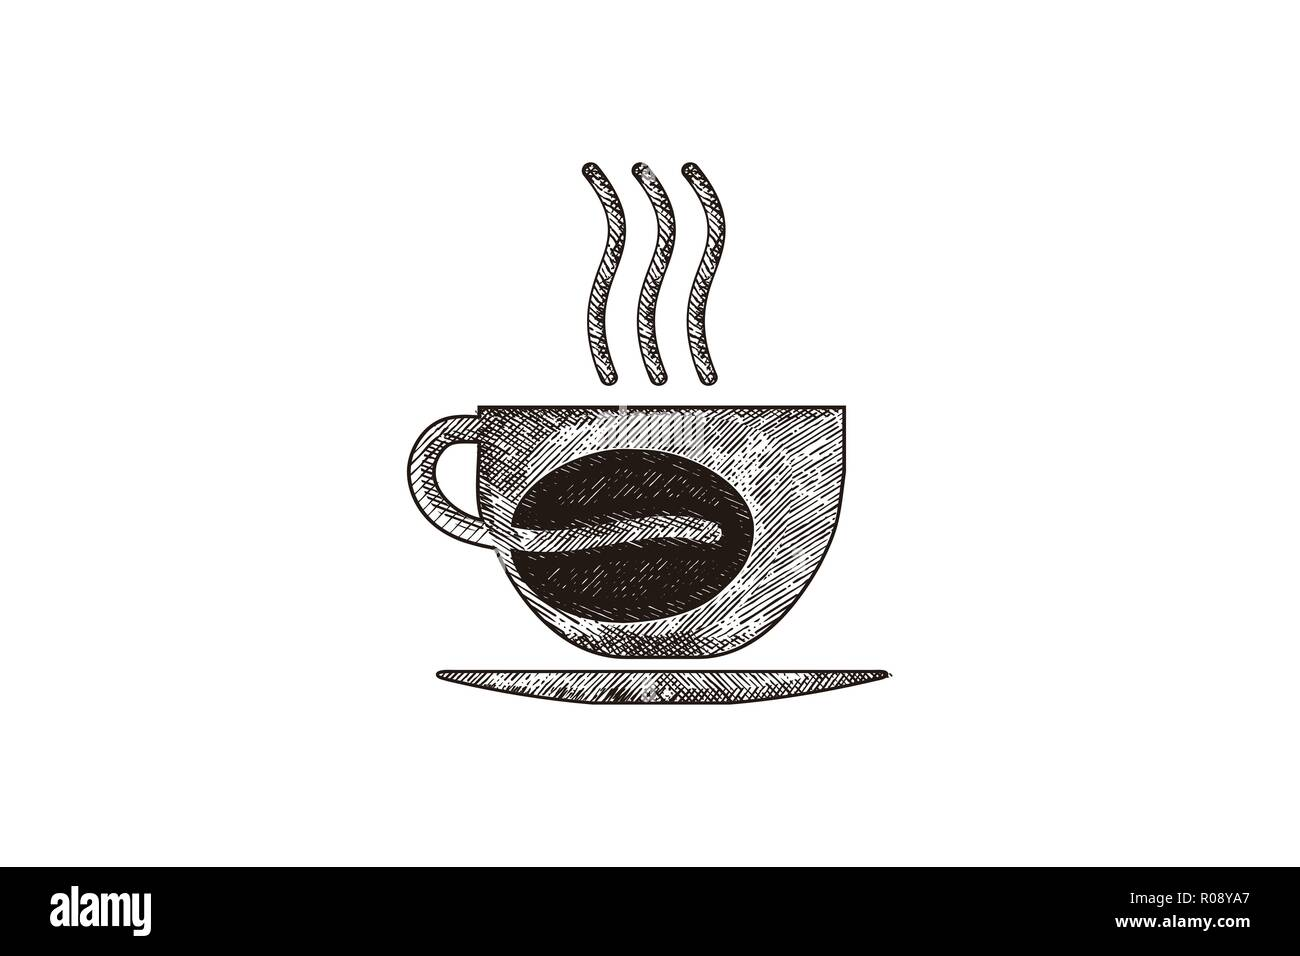 25+ Background Mug Designs